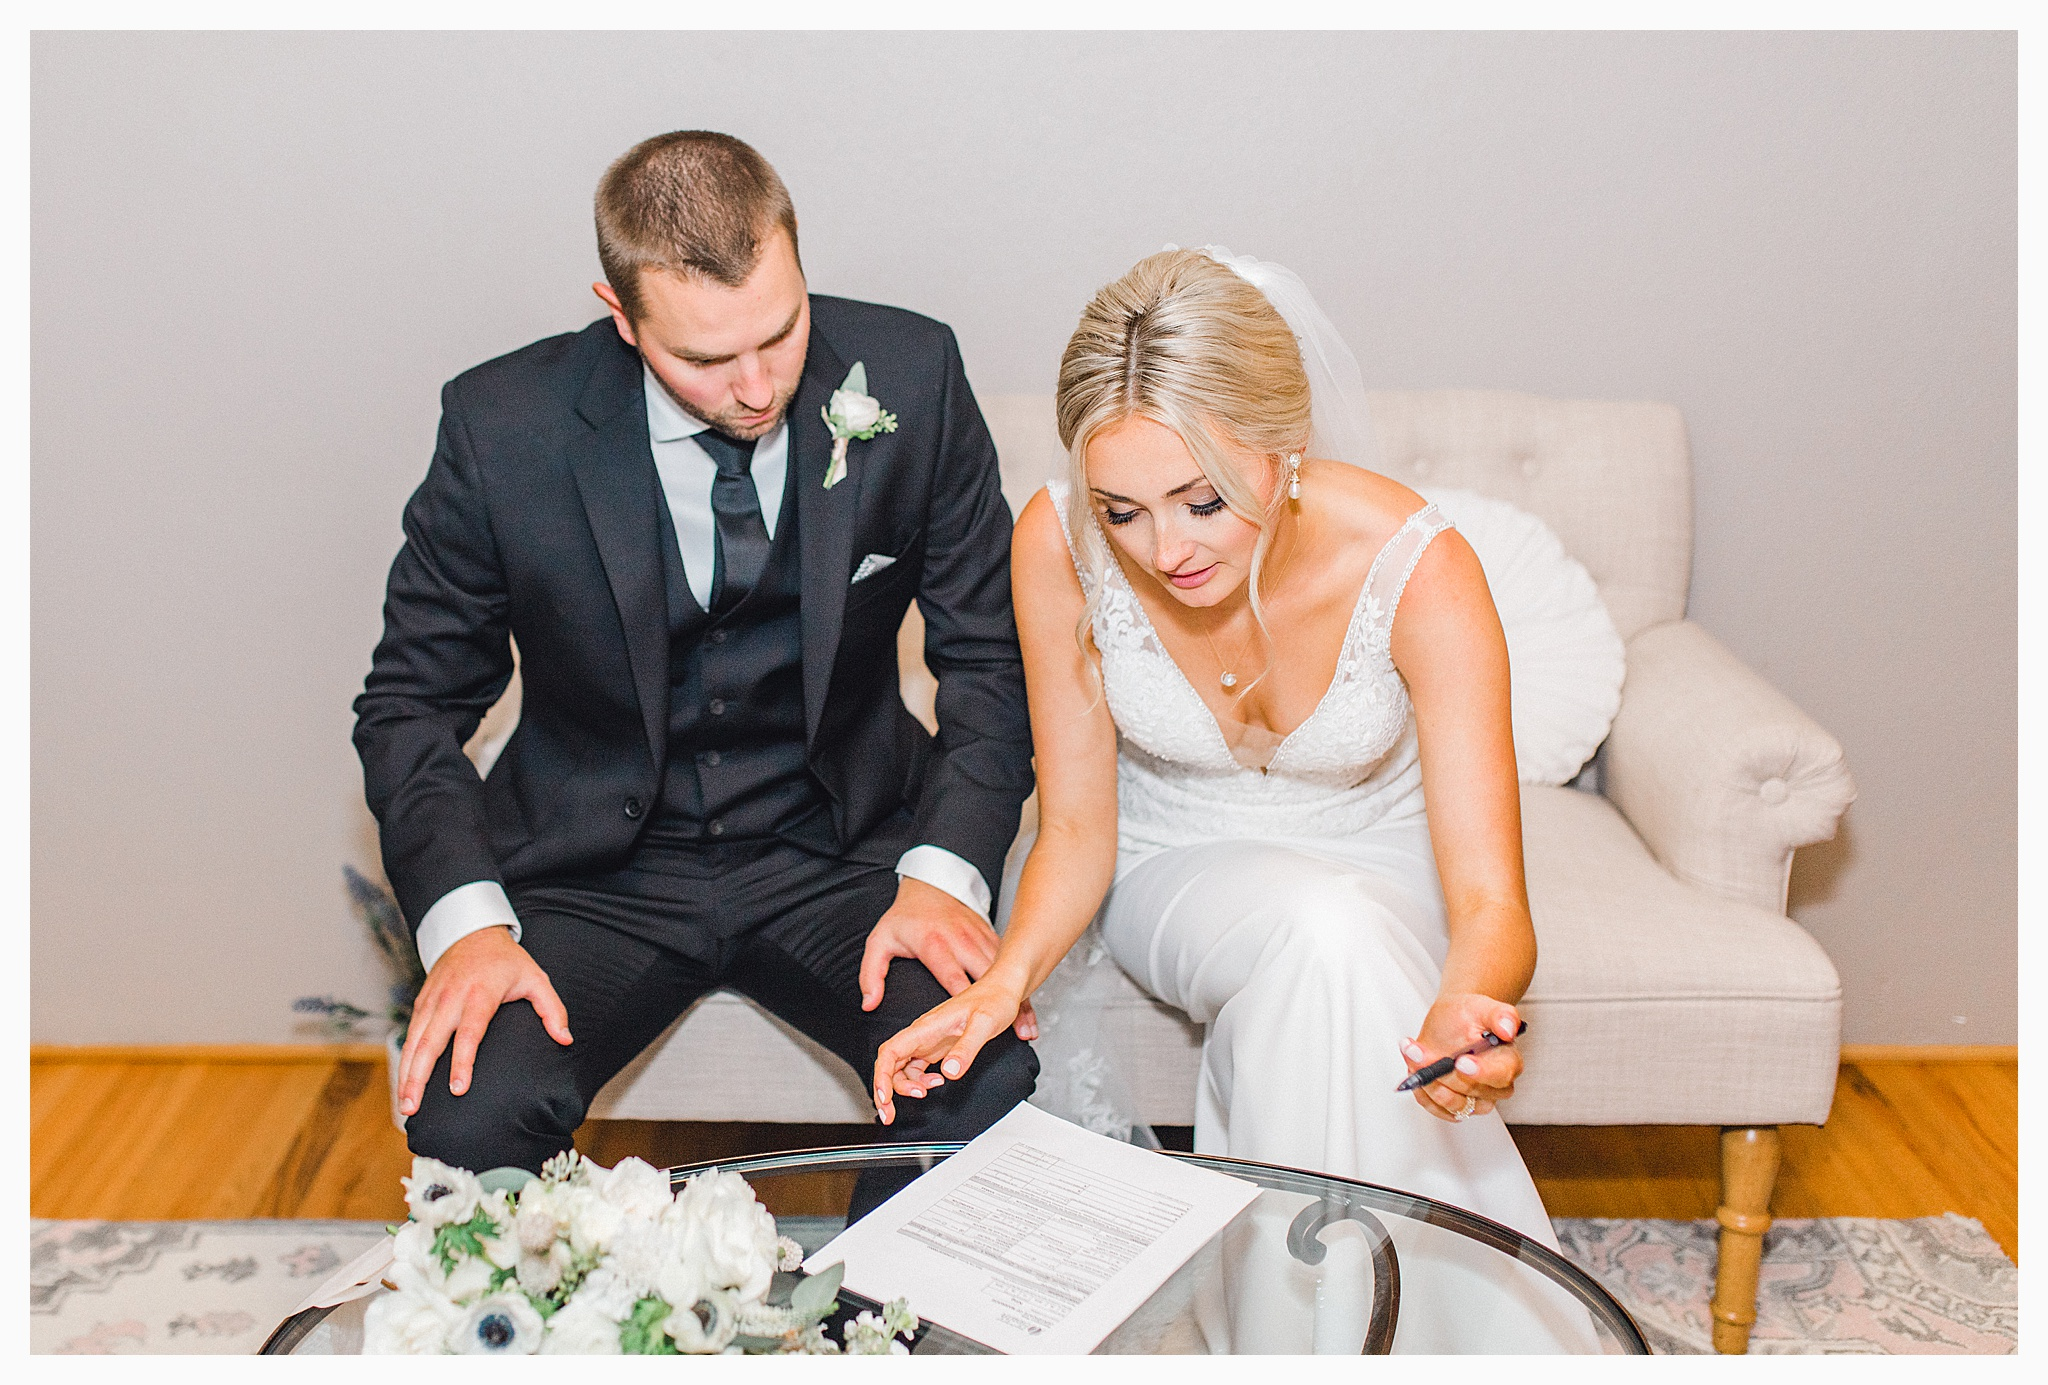 Emma Rose Company Light and Airy Wedding Photographer, Beautiful fall wedding at Rock Creek Gardens Venue in Puyallup, Washington._0090.jpg